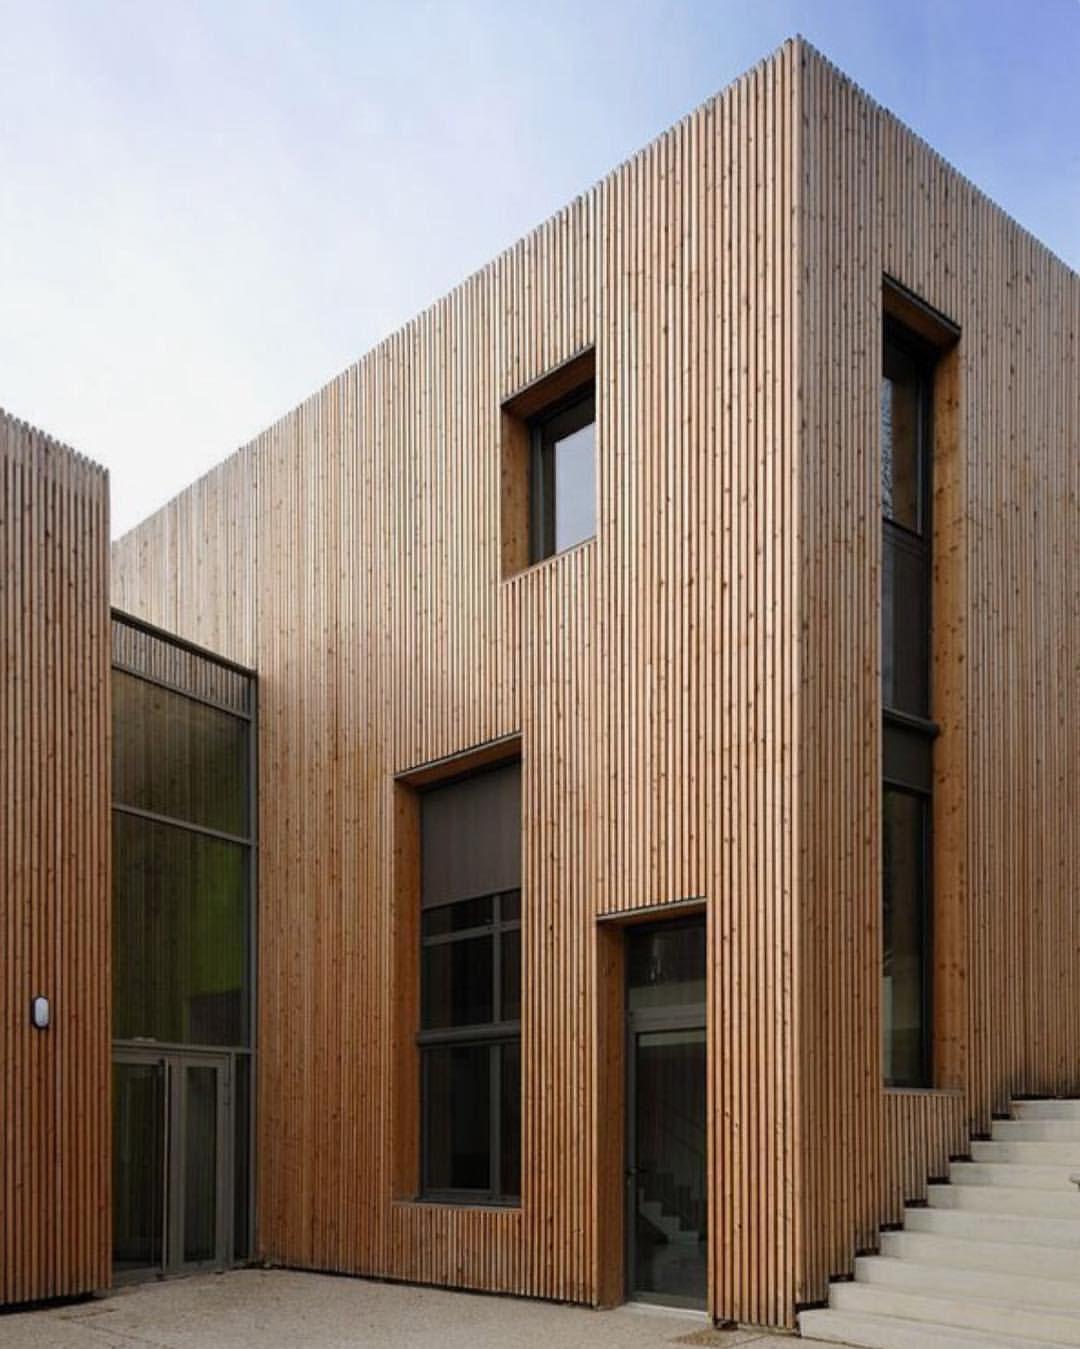 Design Interiors Architecture Thelocalproject On Instagram Vertical Timber Panelling Rg Aa7seve Moderne Architektur Fassadengestaltung Architektur Haus